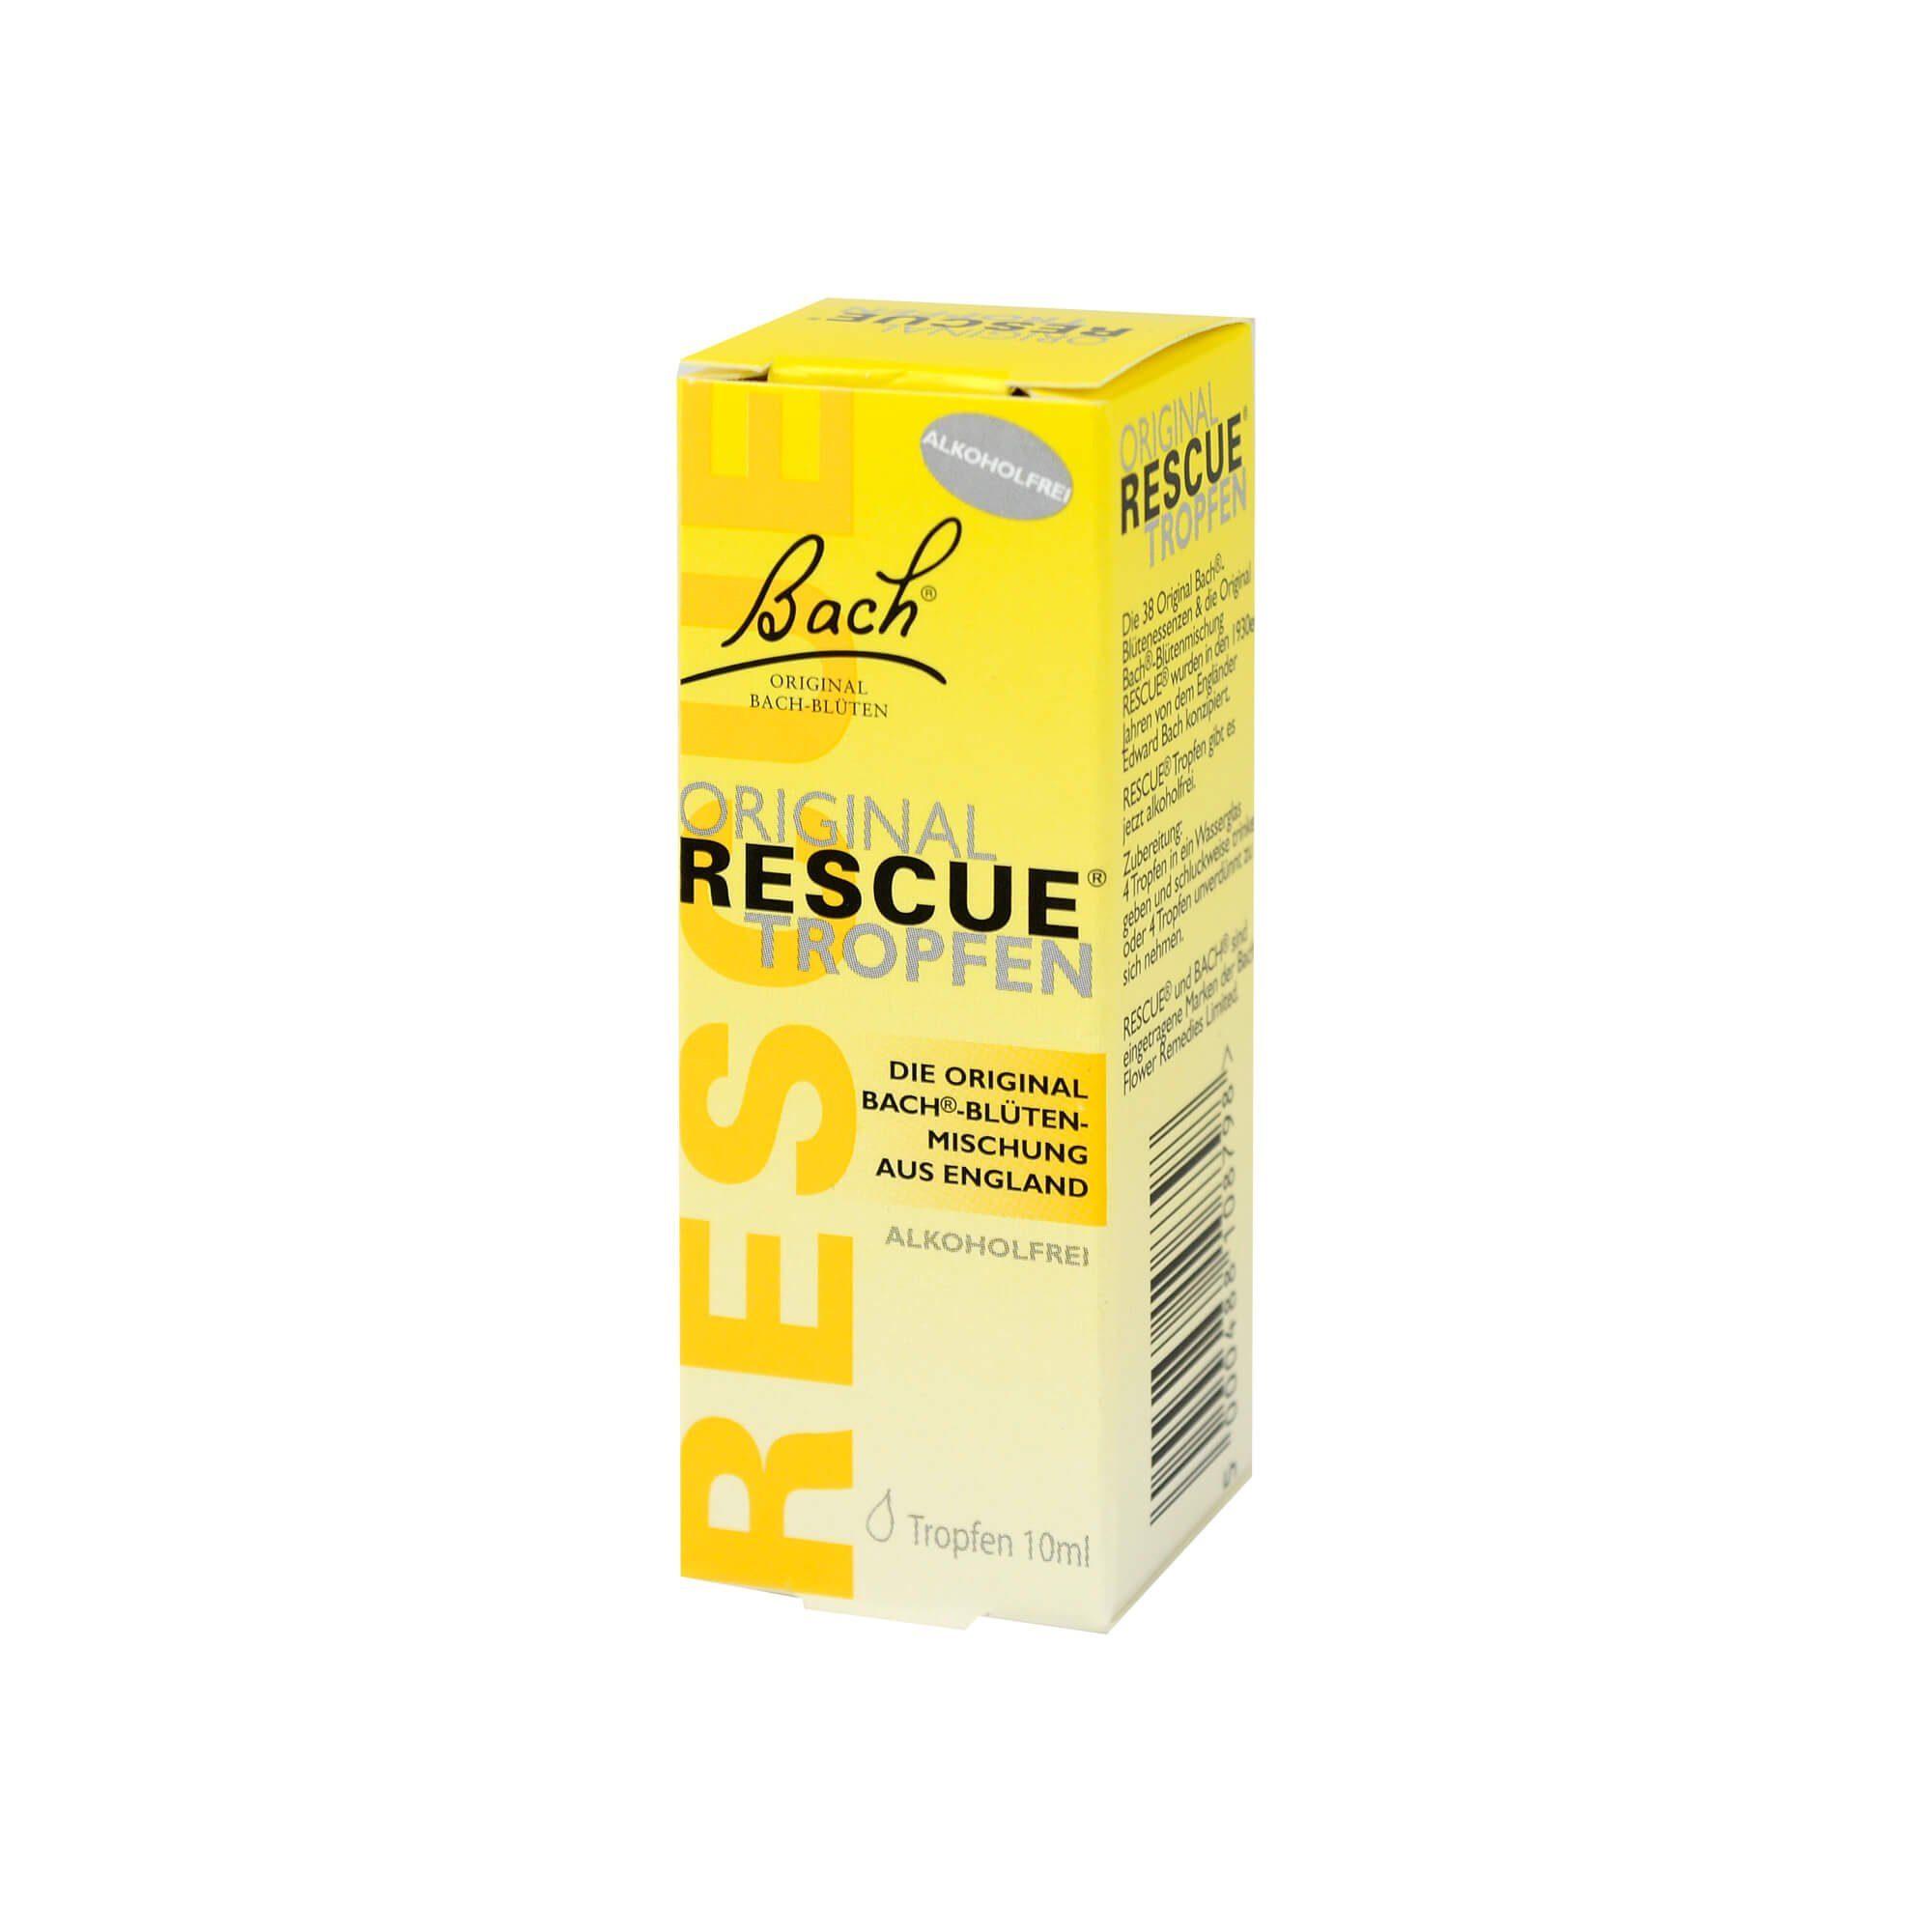 Bach Original Rescue Tropfen alkoholfrei, 10 ml